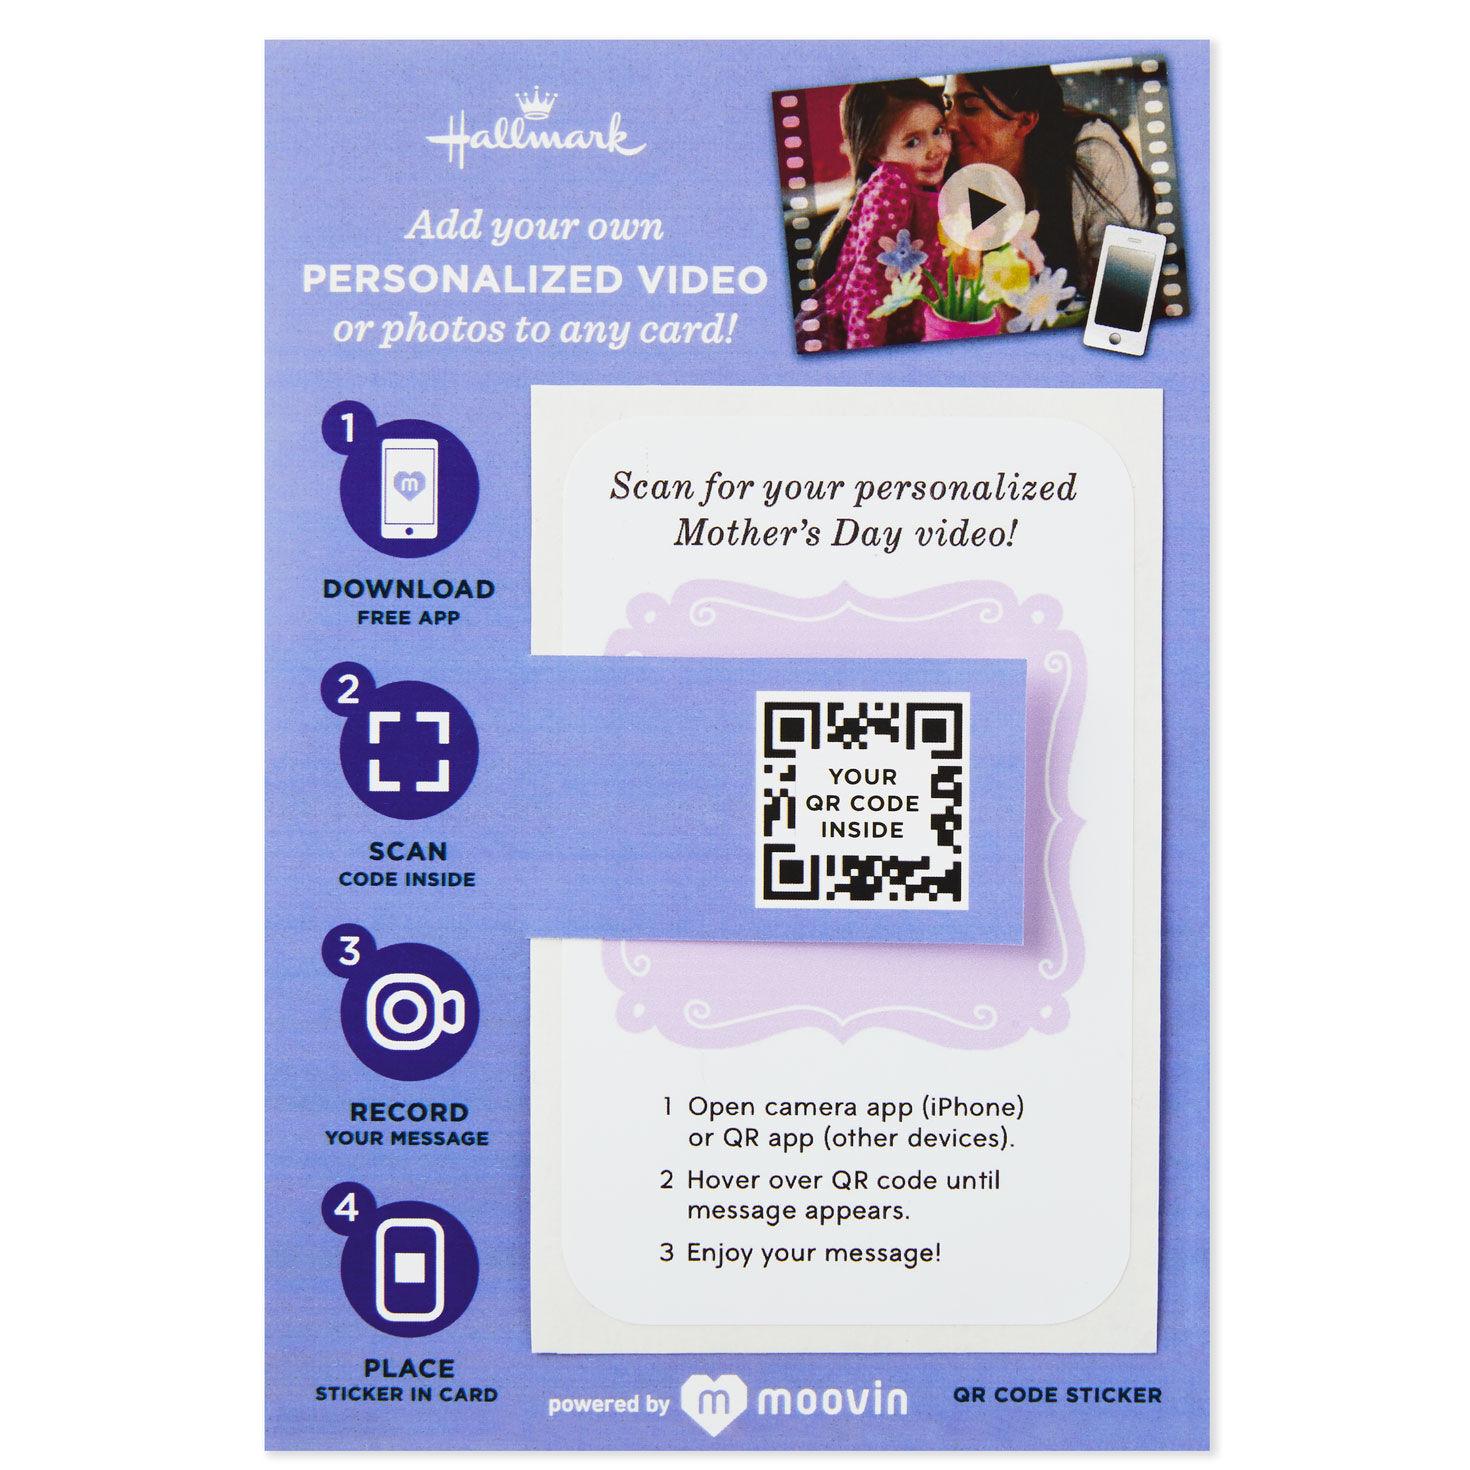 Hallmark create a card free download